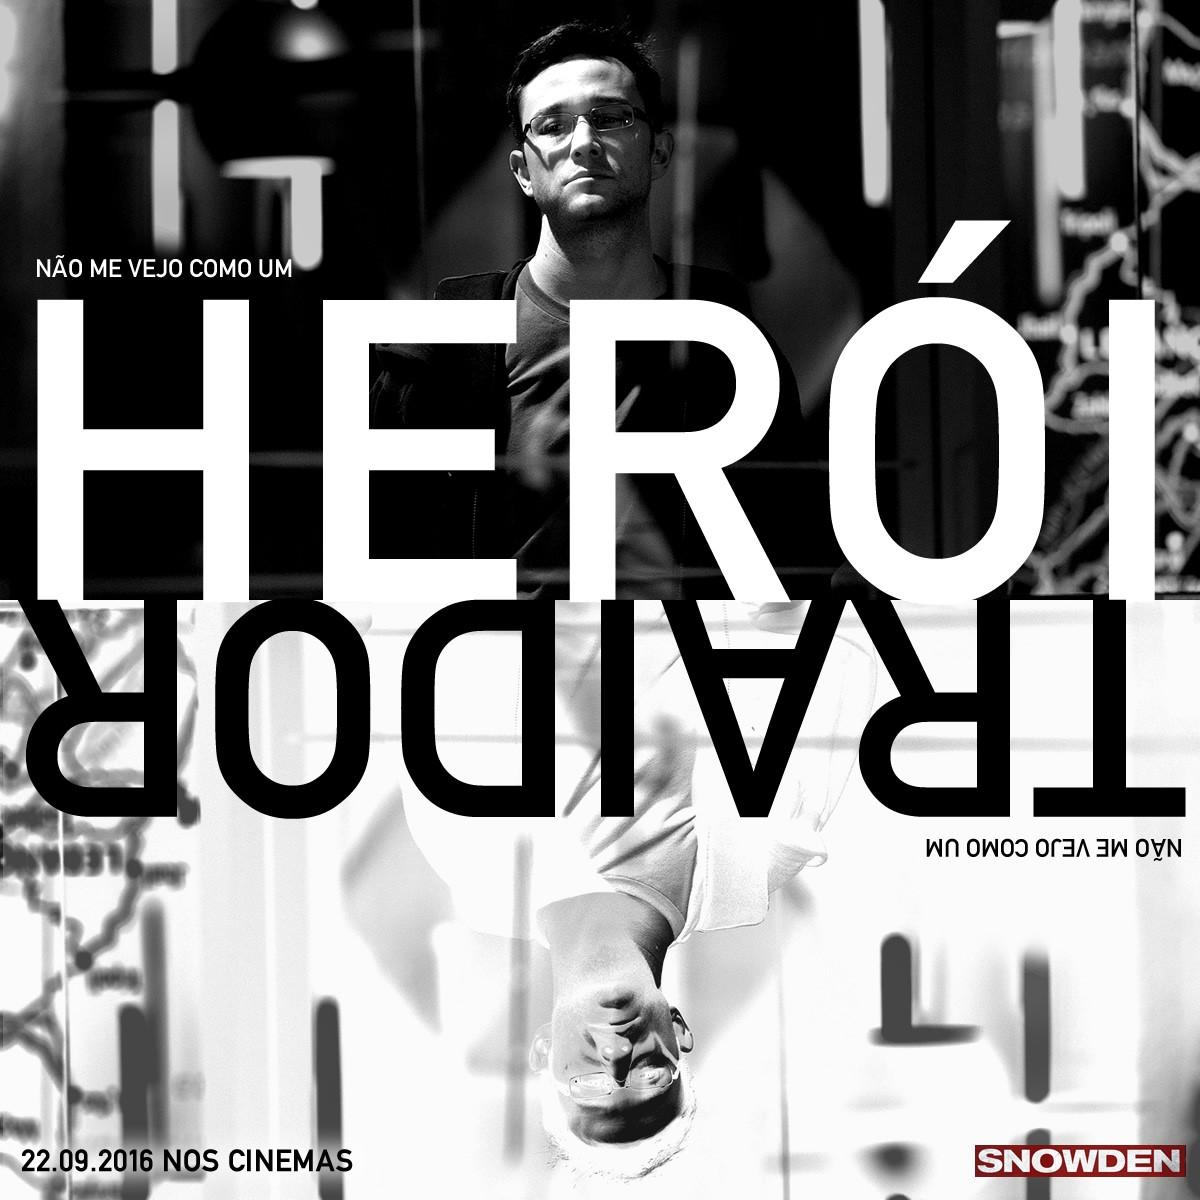 heroi_traidor